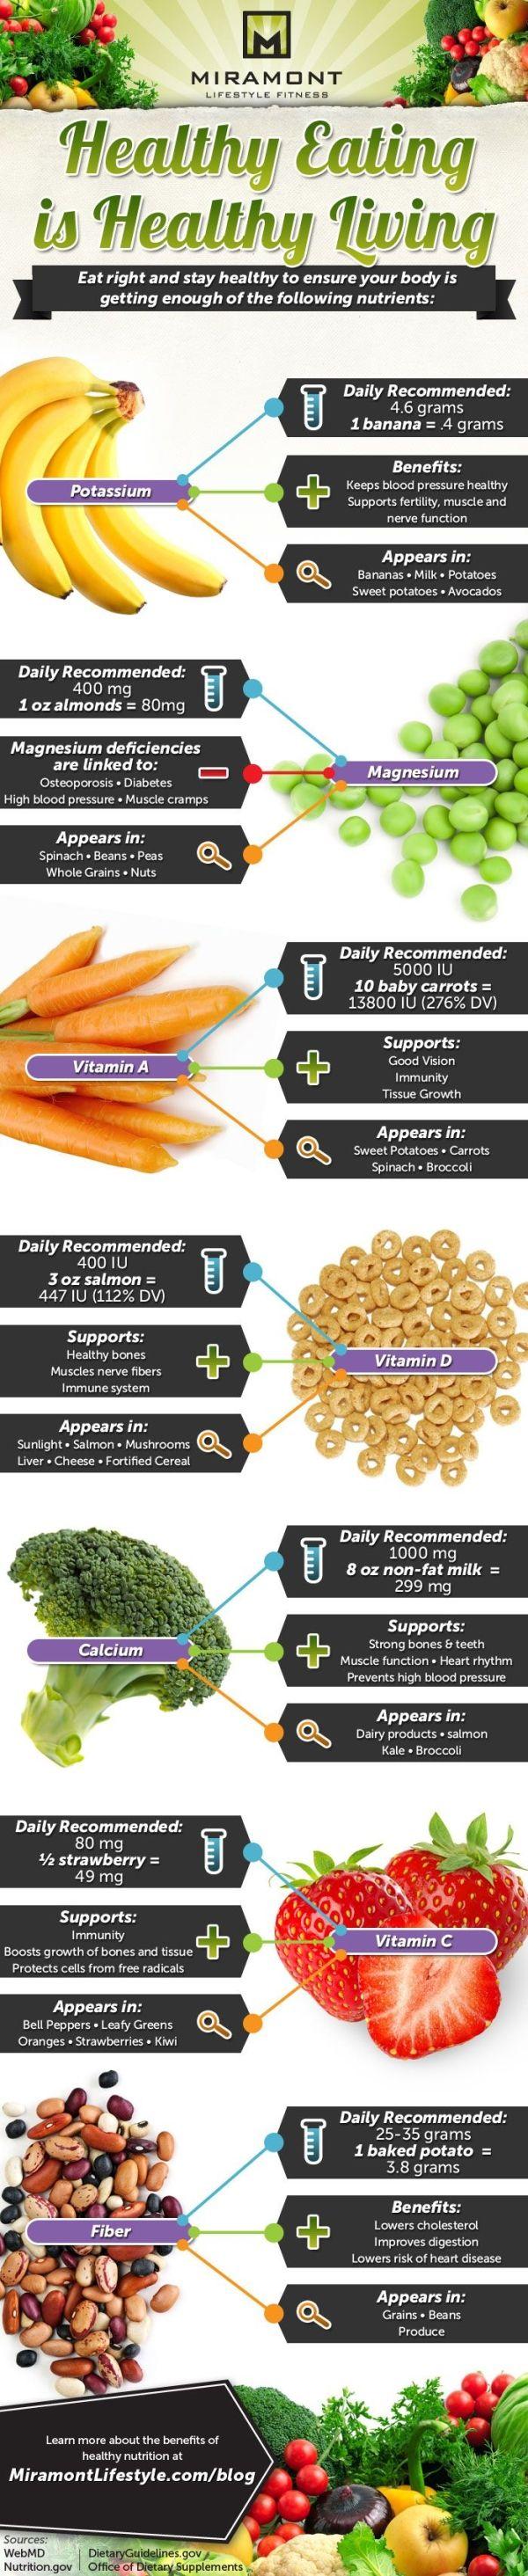 Healthy eating habits [ http://4LifeCenter.com ] #healthy #life #health